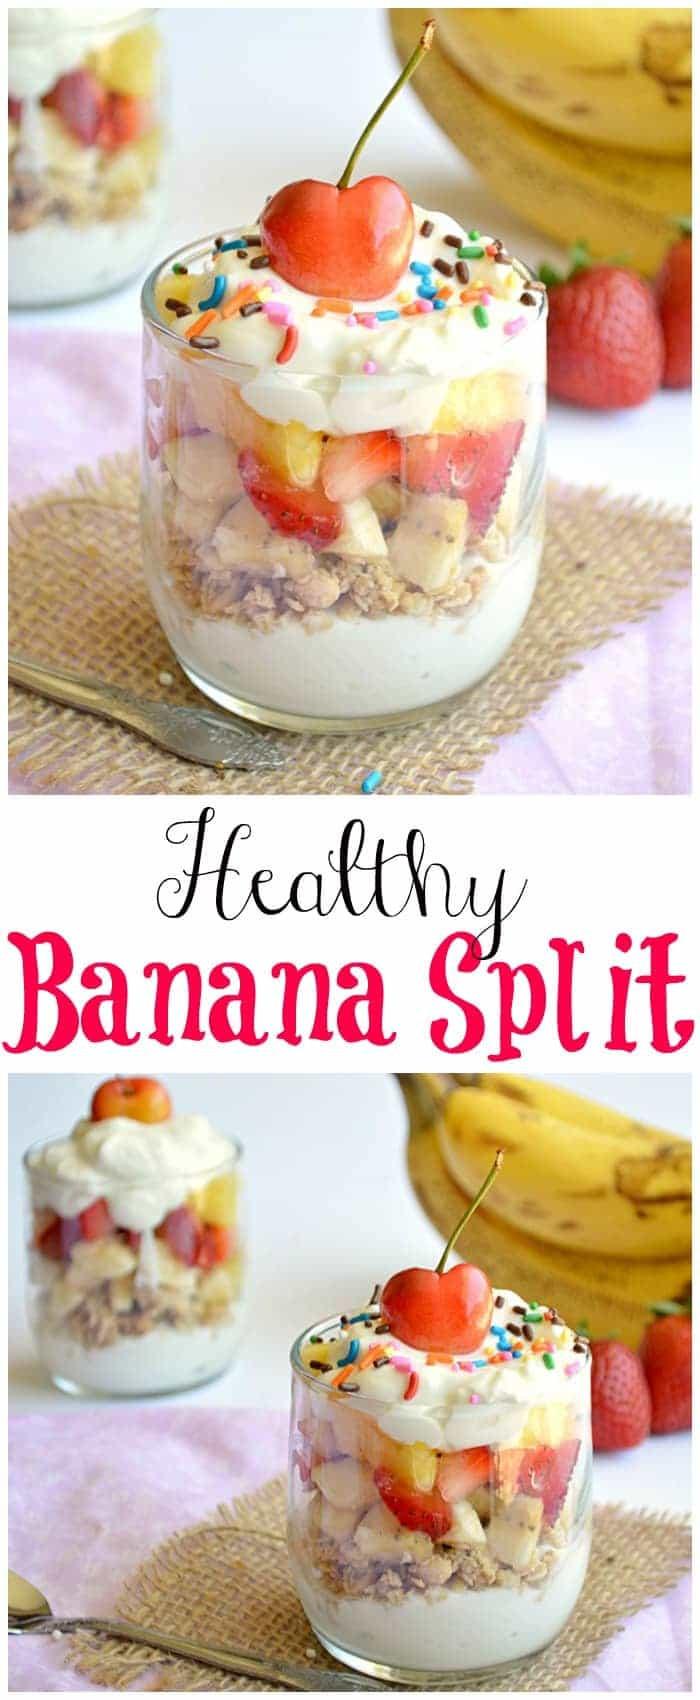 Healthy Banana Dessert  Healthy Banana Split